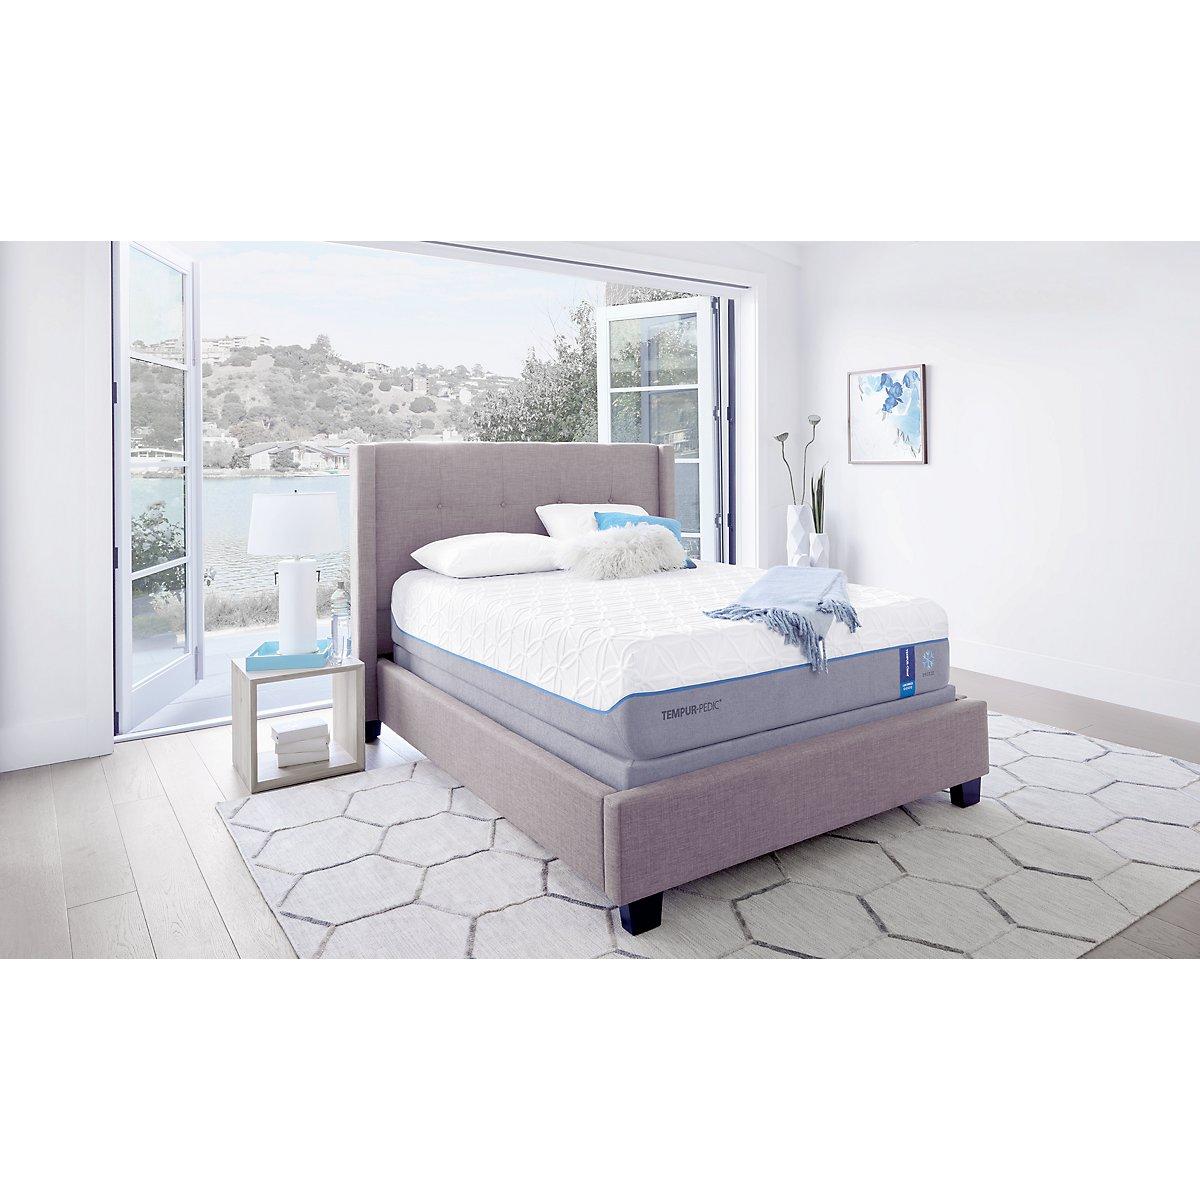 City furniture cld lux bre tempur up adjustable mattress set for Furniture mattress city